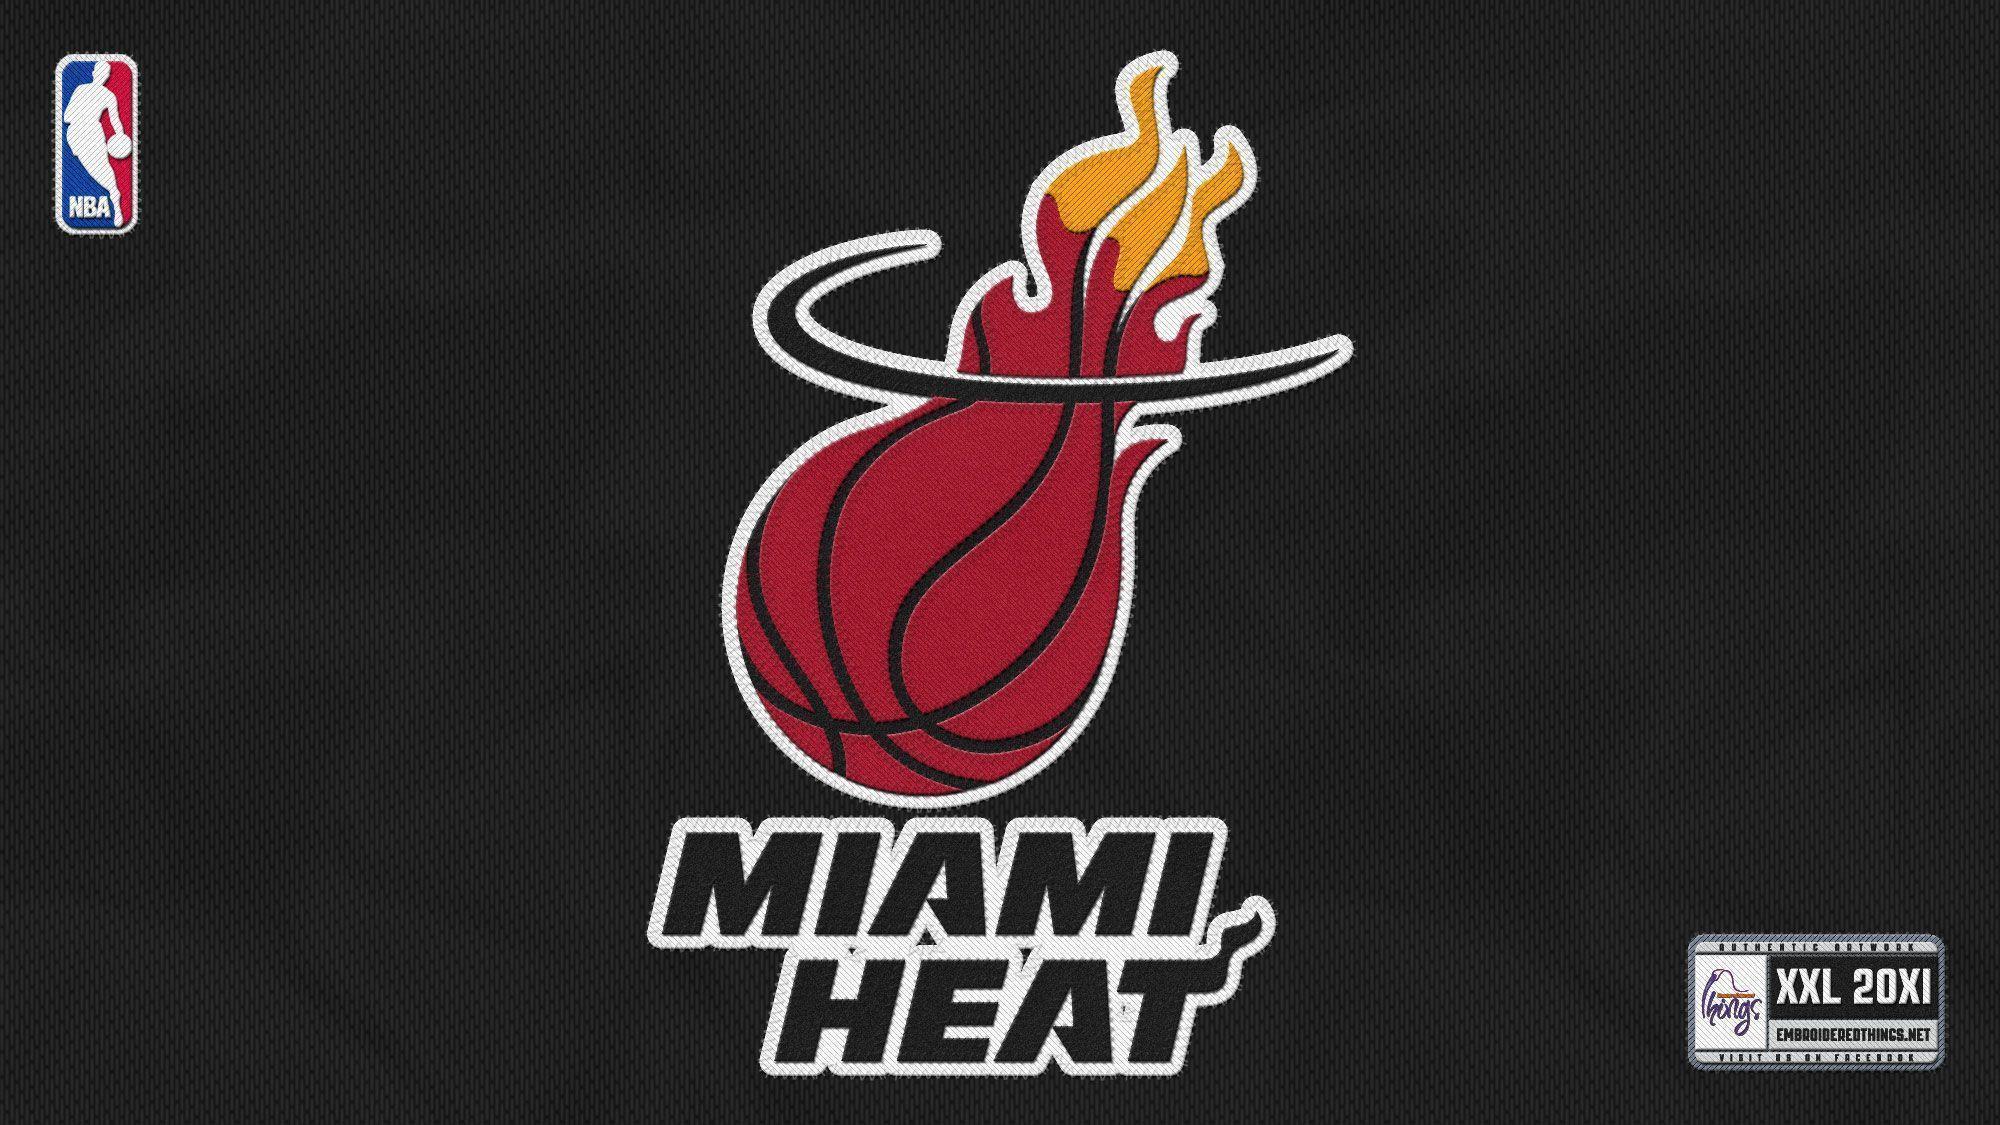 Miami Heat Wallpapers HD - Wallpaper Cave